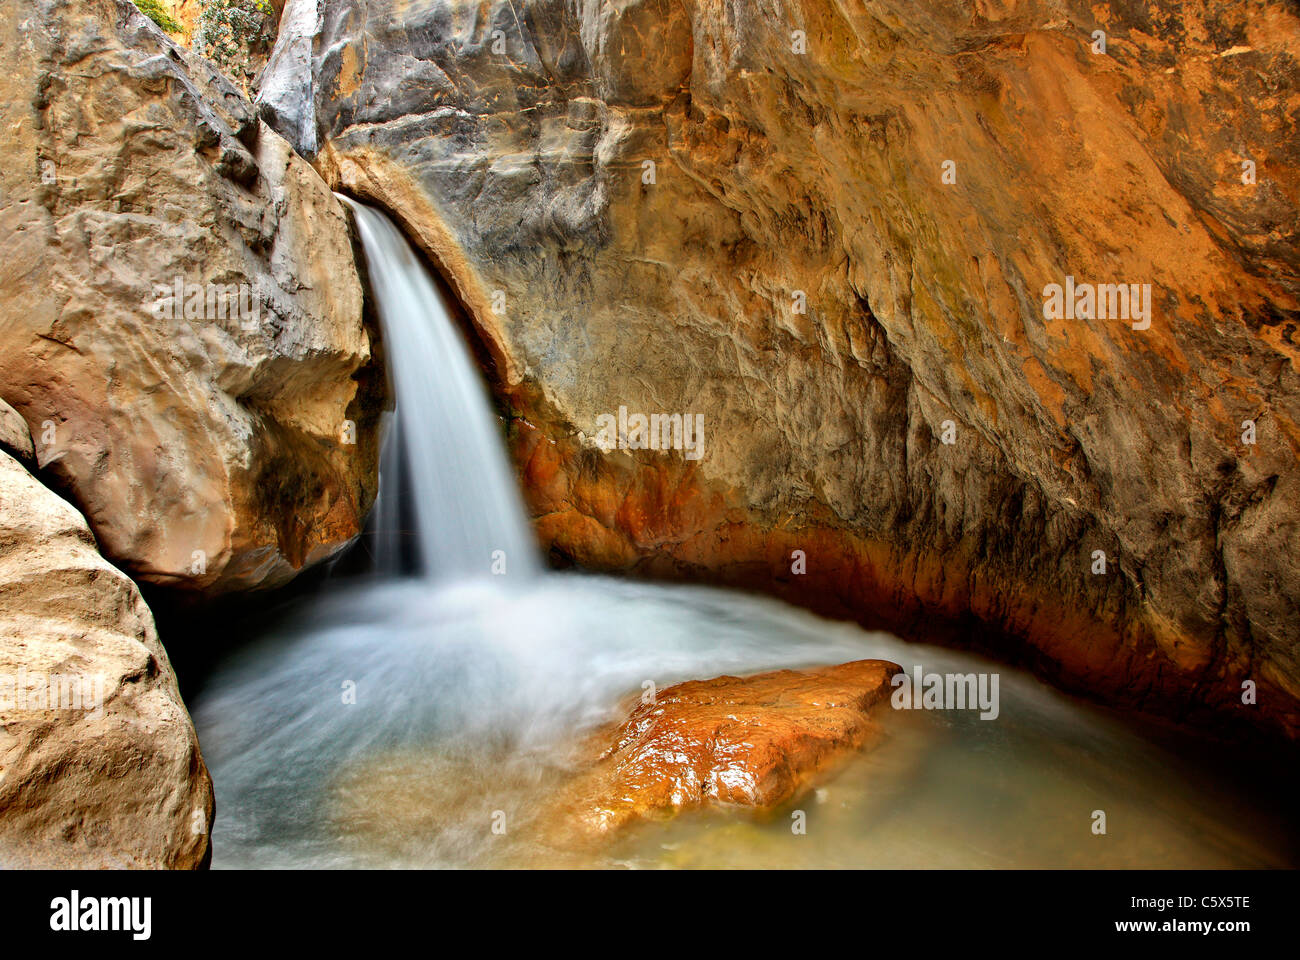 One of the waterfalls in Sarakina Gorge close to Mythoi village, about 20 km west of Ierapetra, Lasithi, Crete, - Stock Image